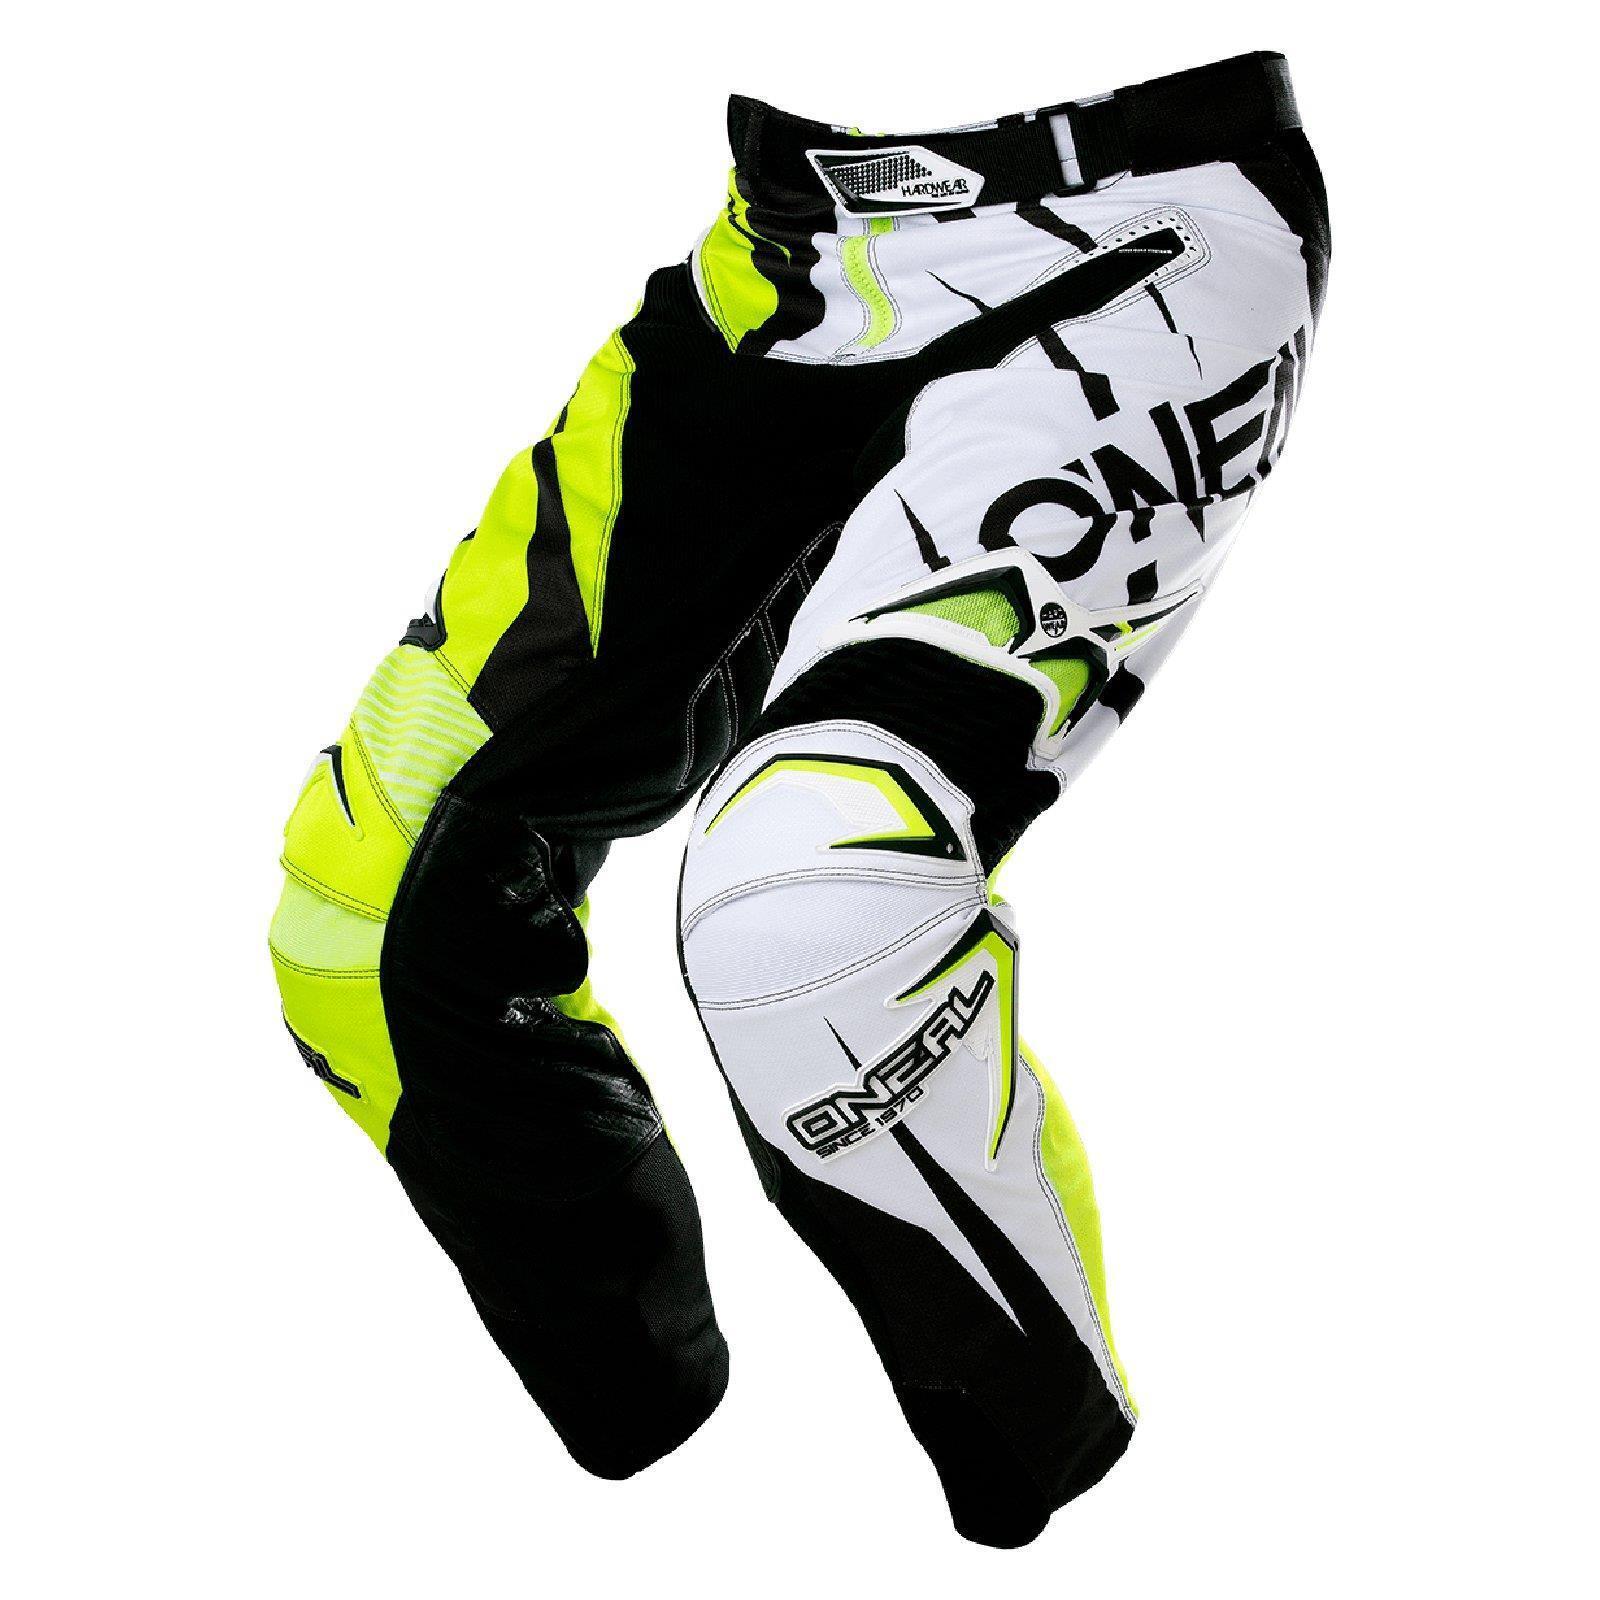 O'Neal Hardwear MX Hose JAG LE Schwarz Neon Gelb Motocross Enduro Cross Motorrad